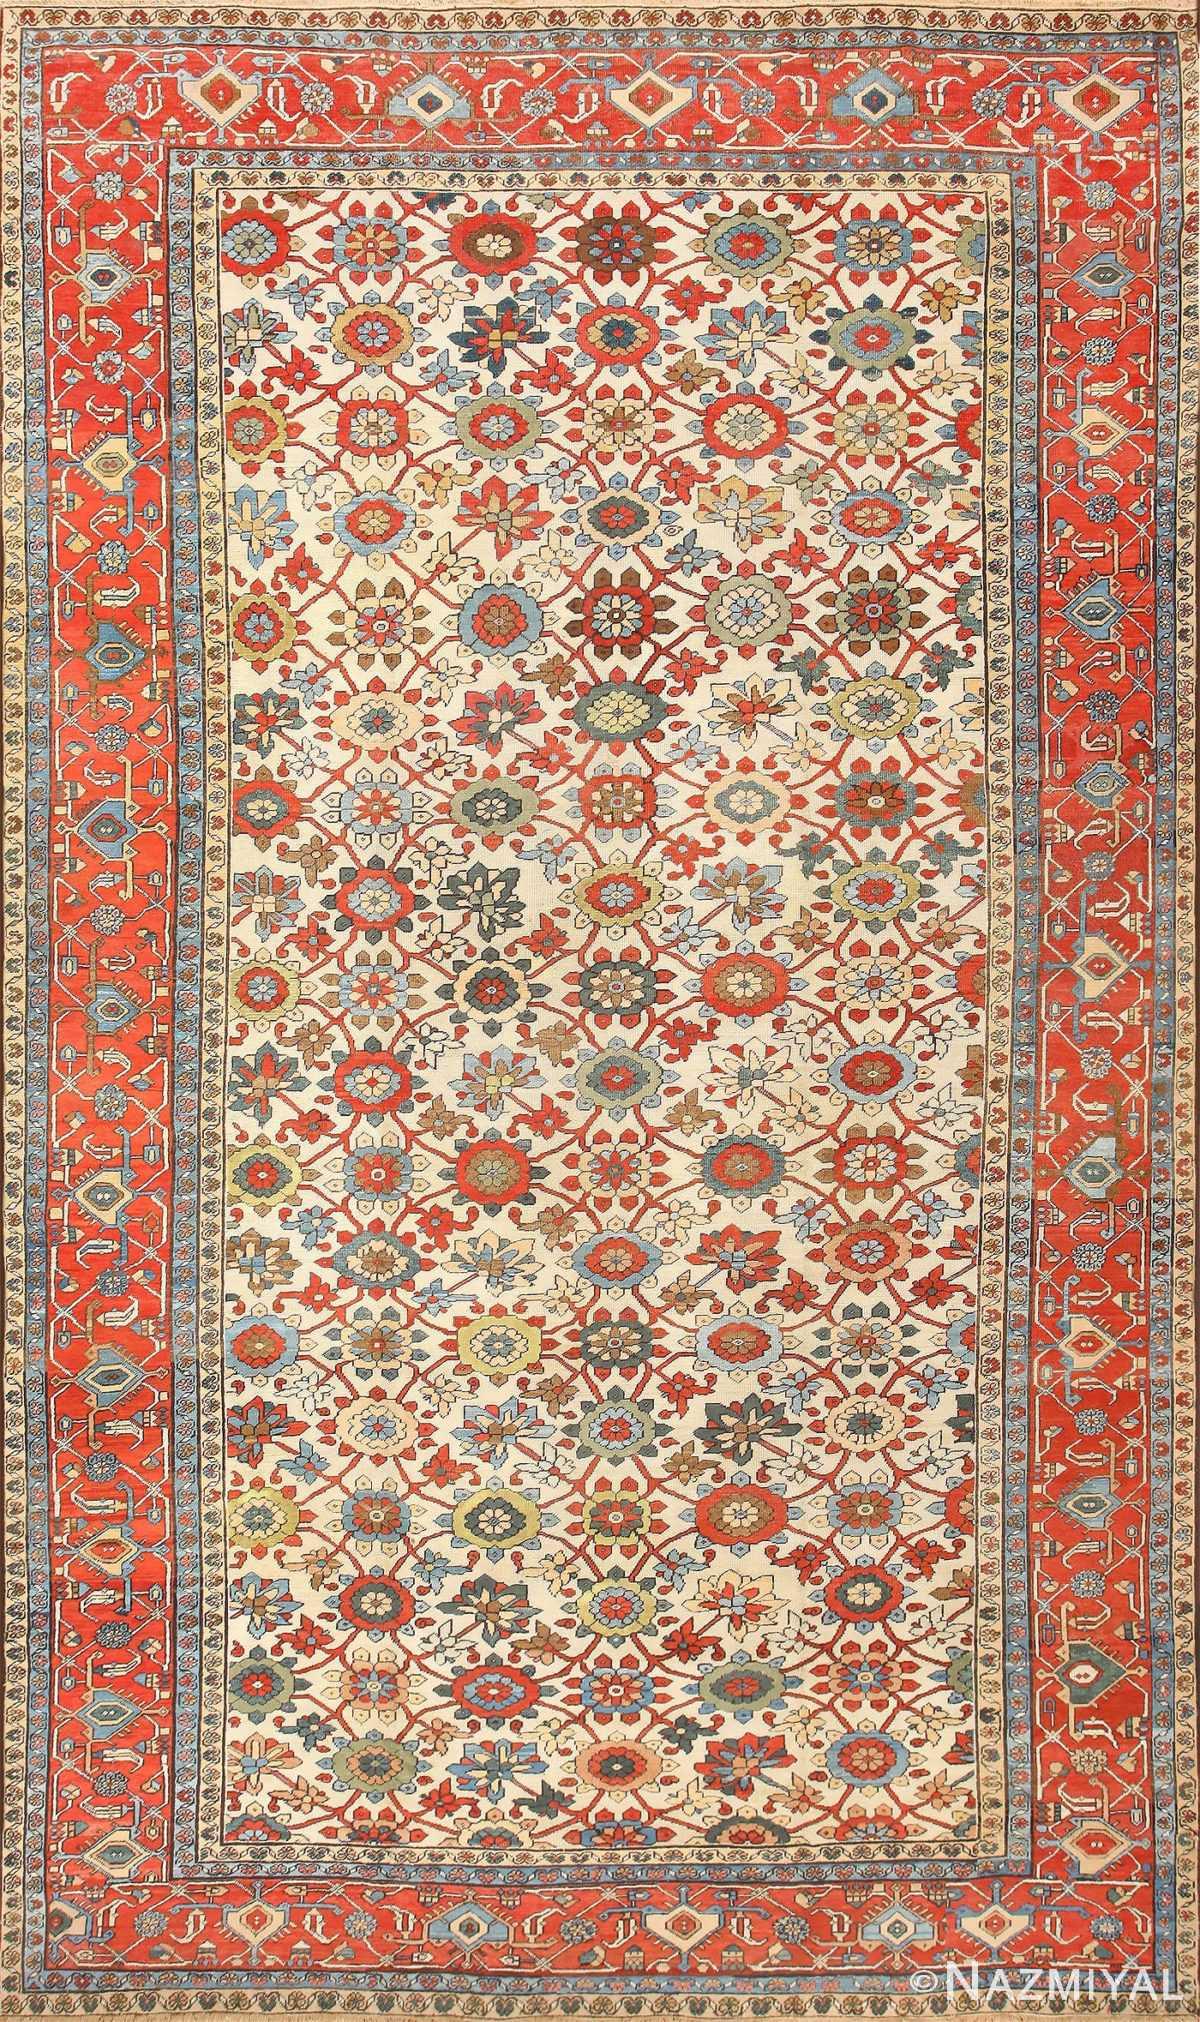 Large Colorful Antique Persian Serapi Rug 50593 Nazmiyal